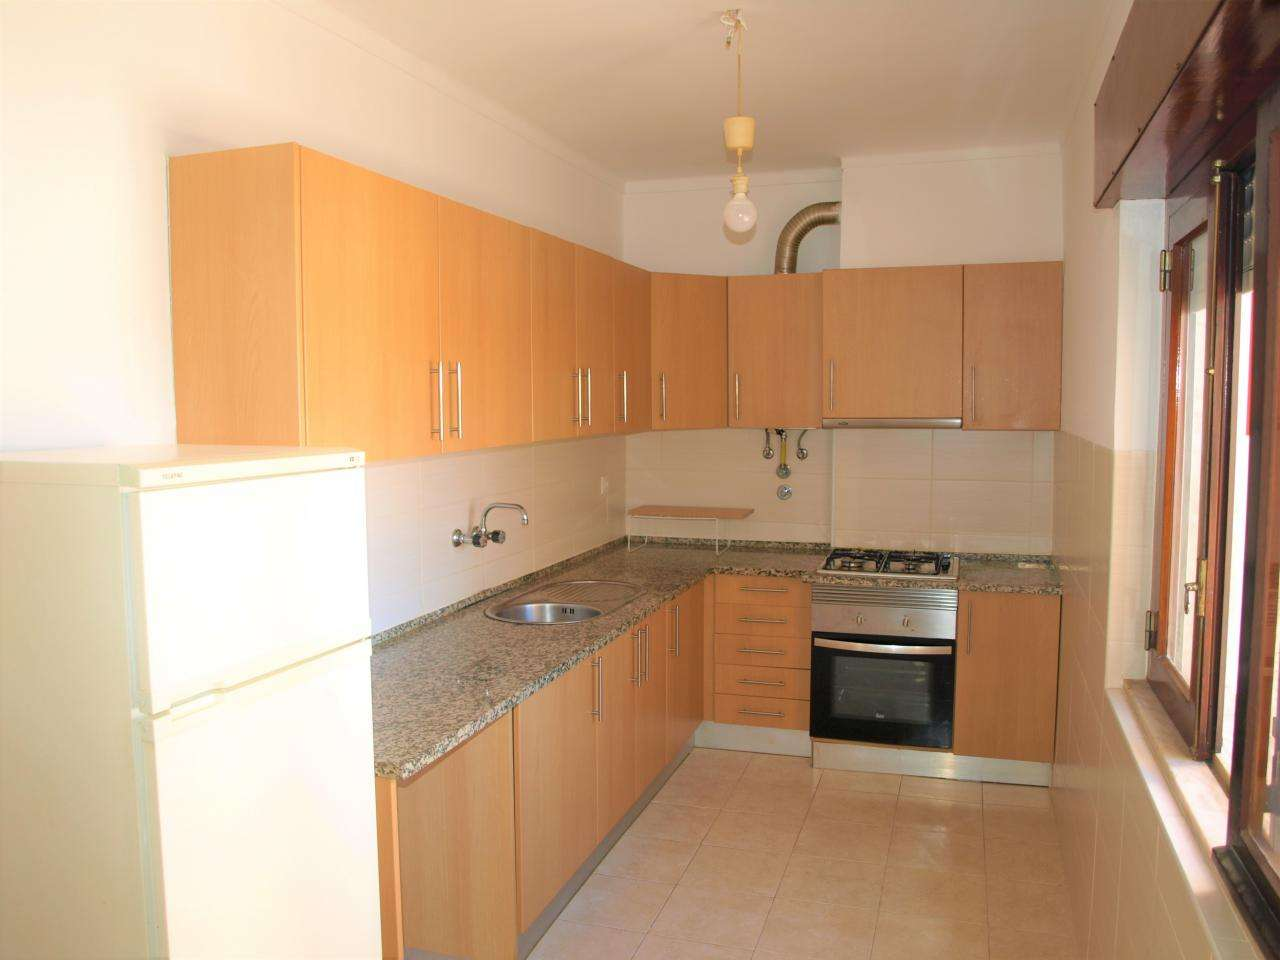 Apartamento para arrendar, Corroios, Setúbal - Foto 2